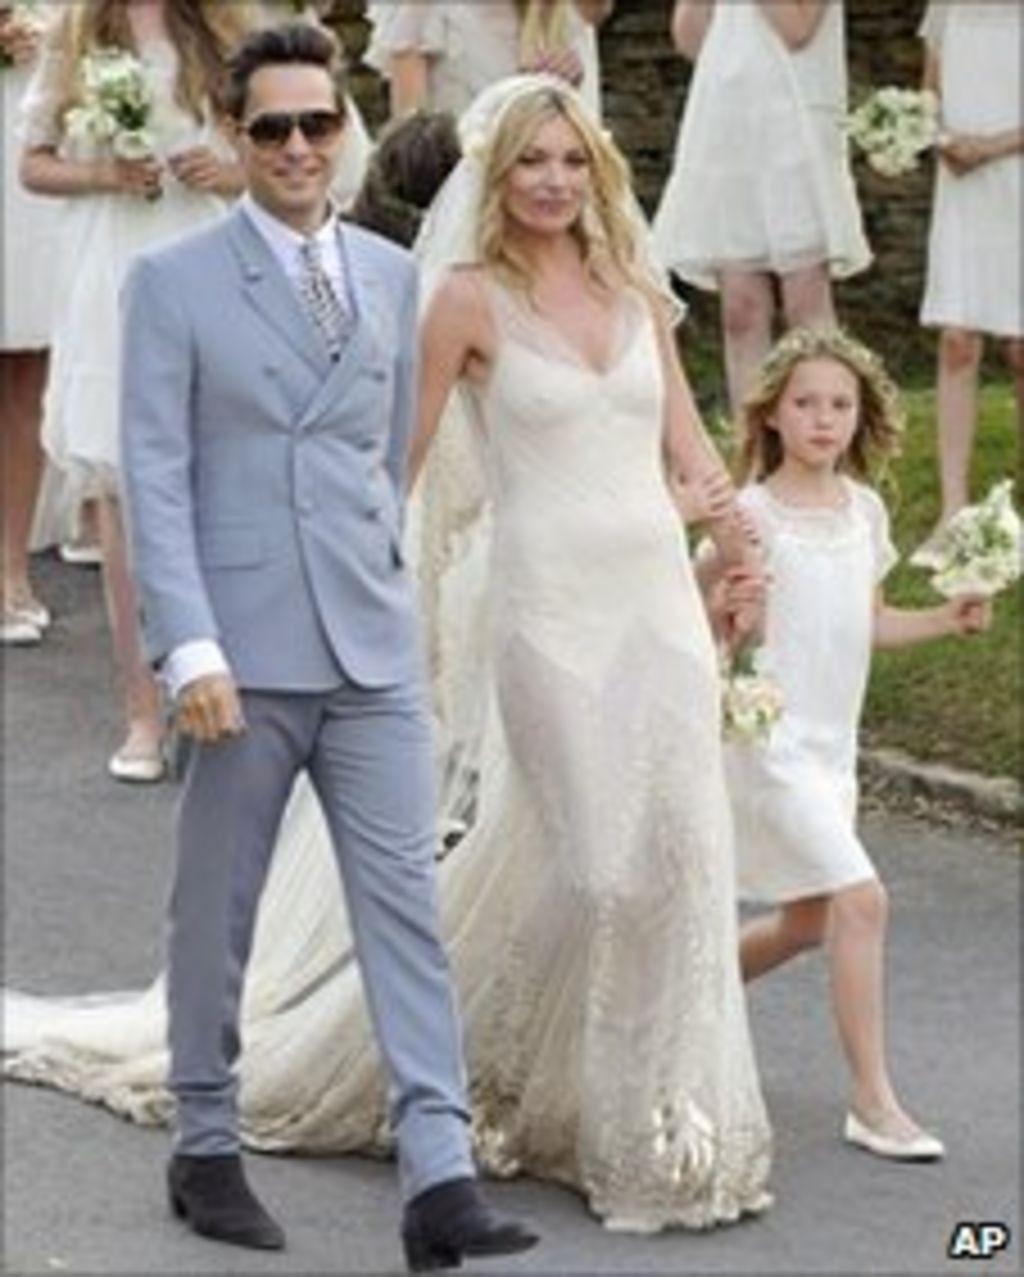 Kate Moss And Jamie Hince Wedding Shuts Roads Bbc News